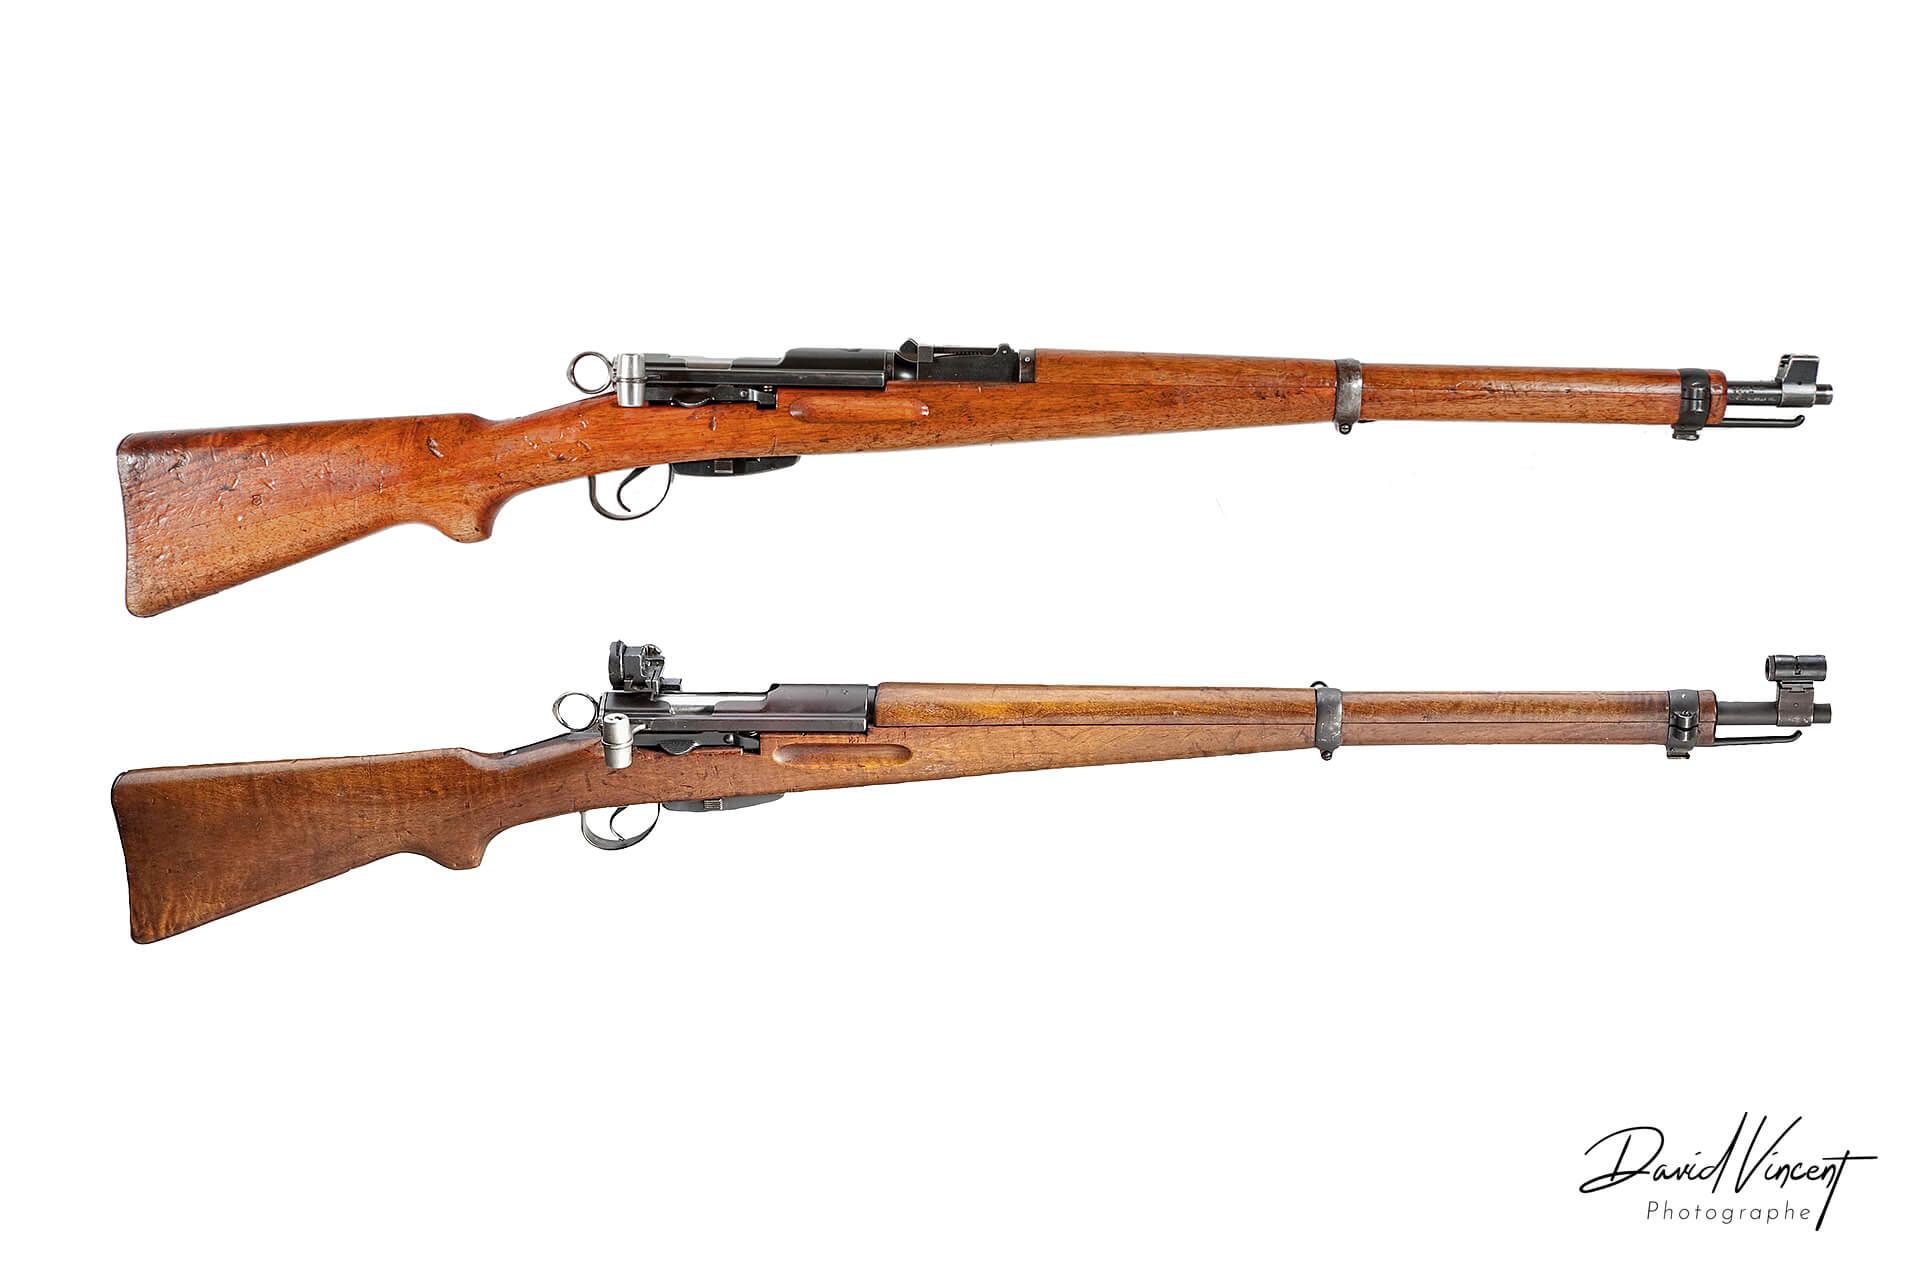 Swiss K31 Firearms Photographer